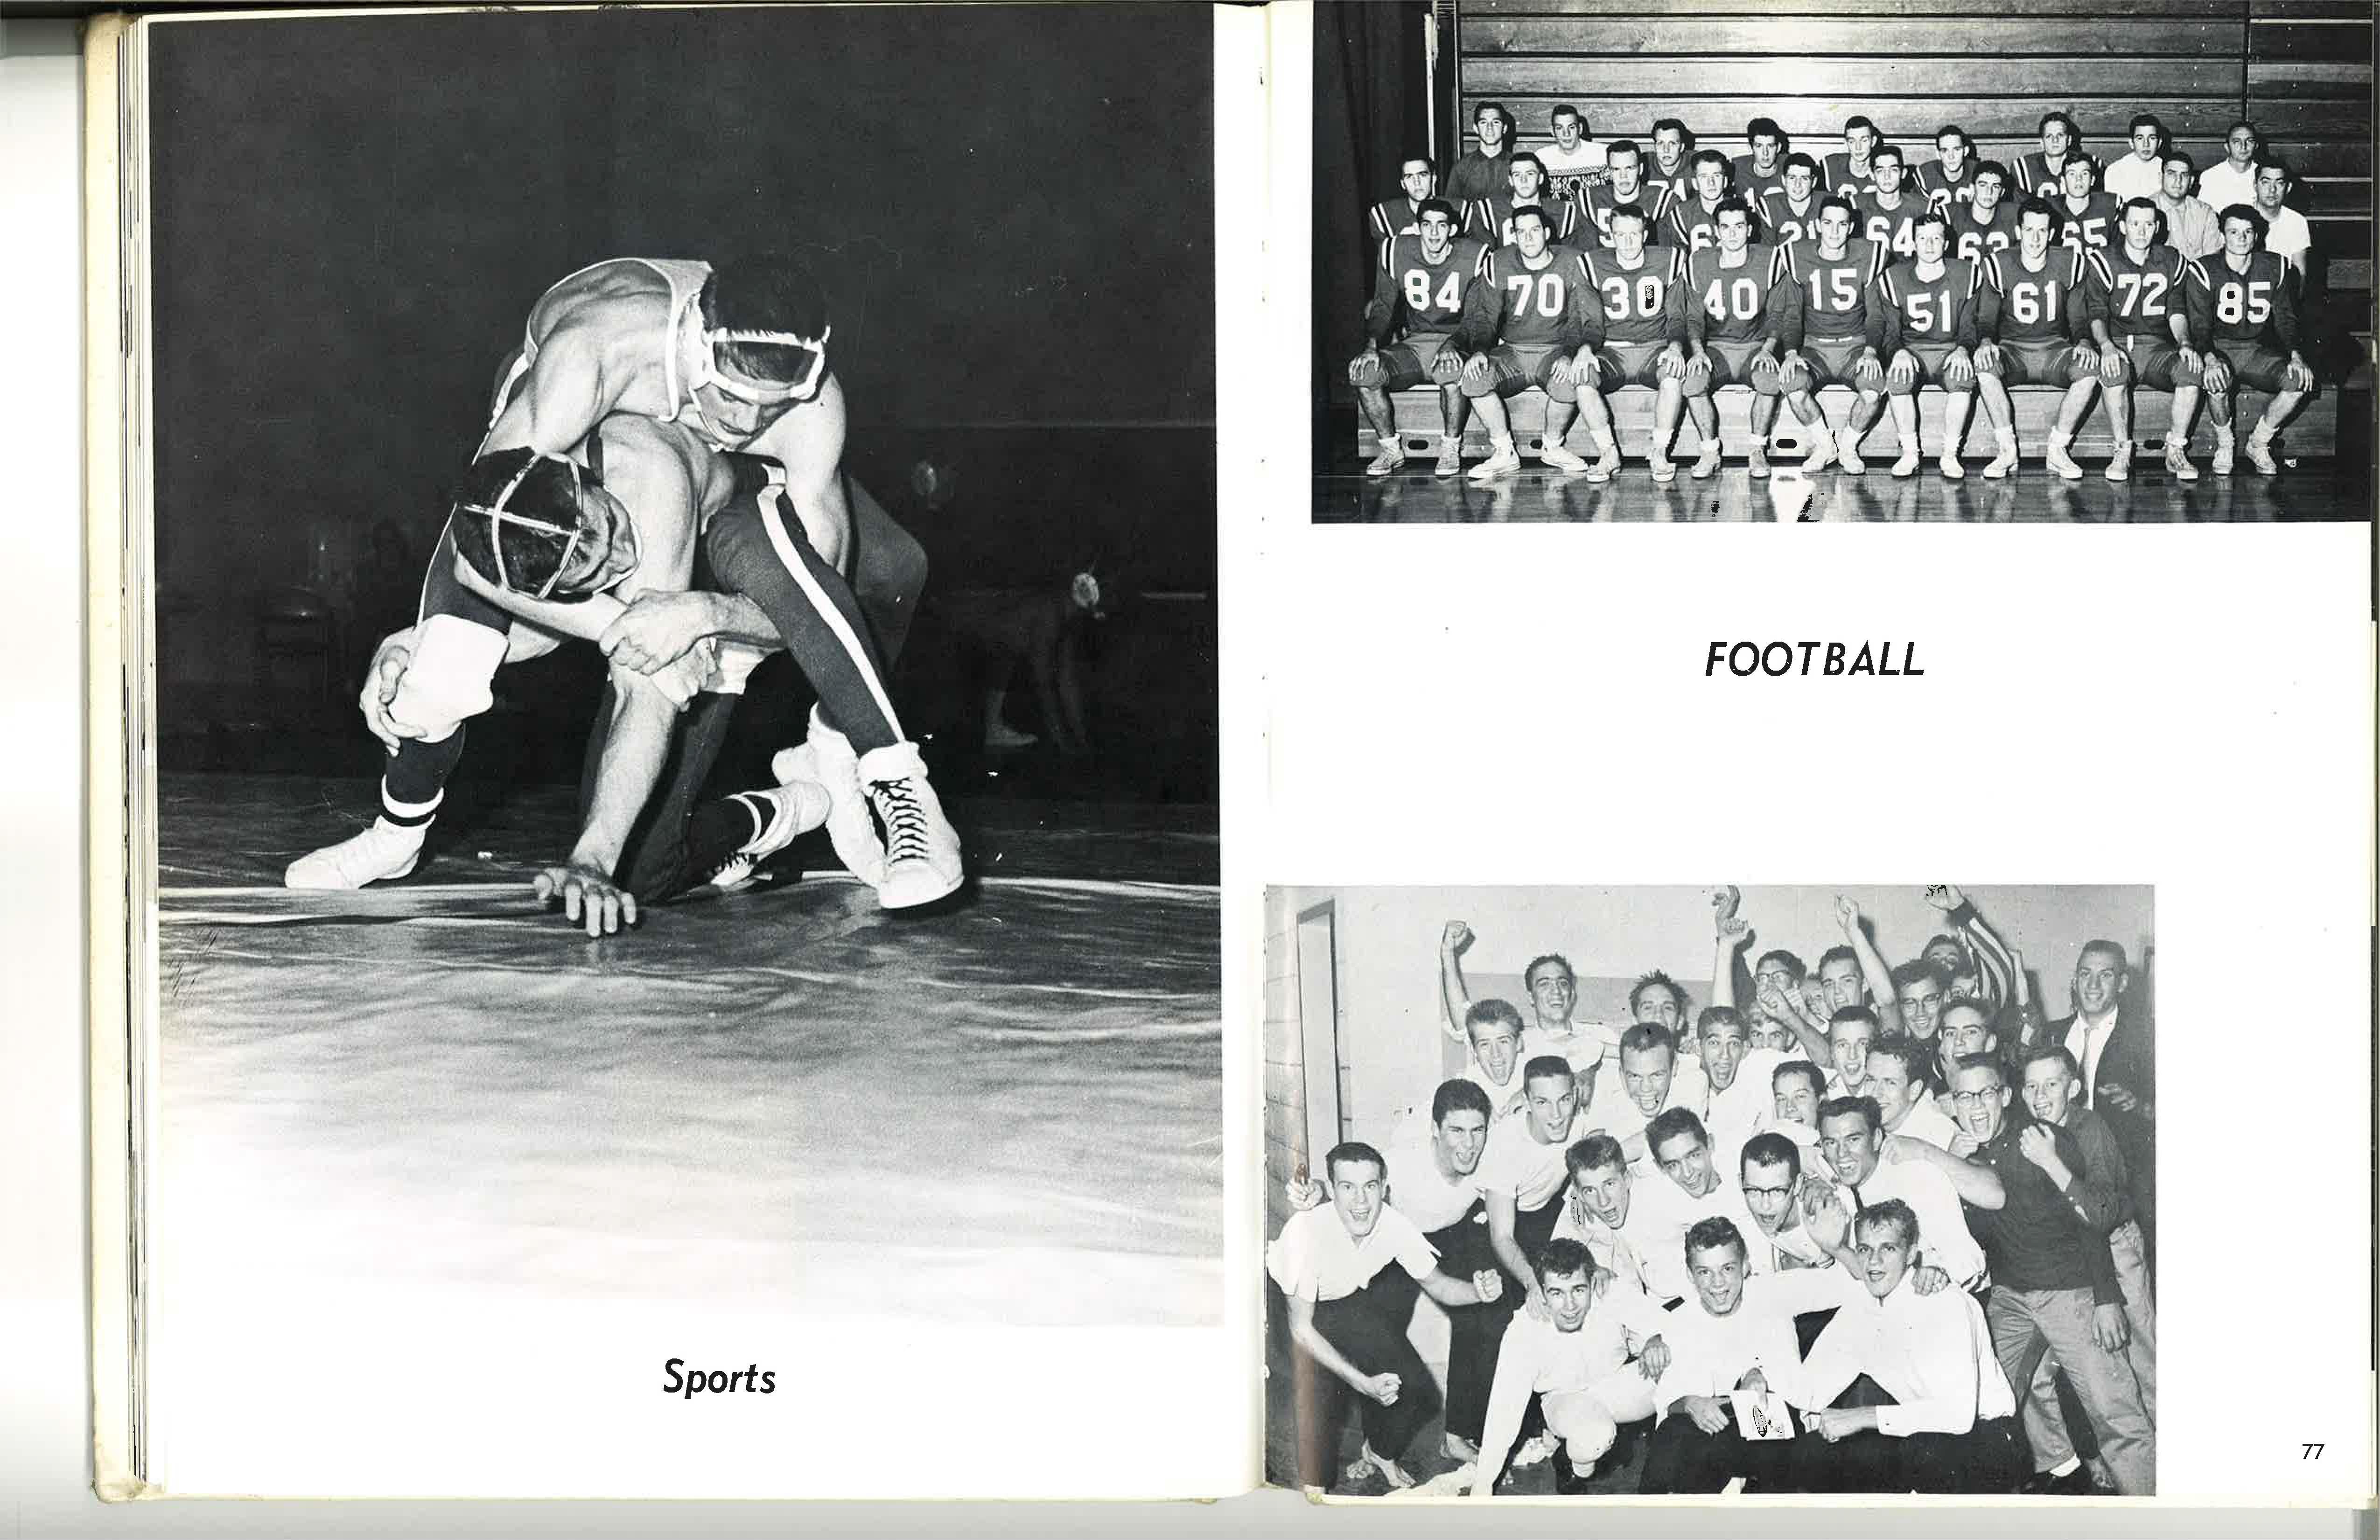 1964_Yearbook_Athletics_76-77.jpg